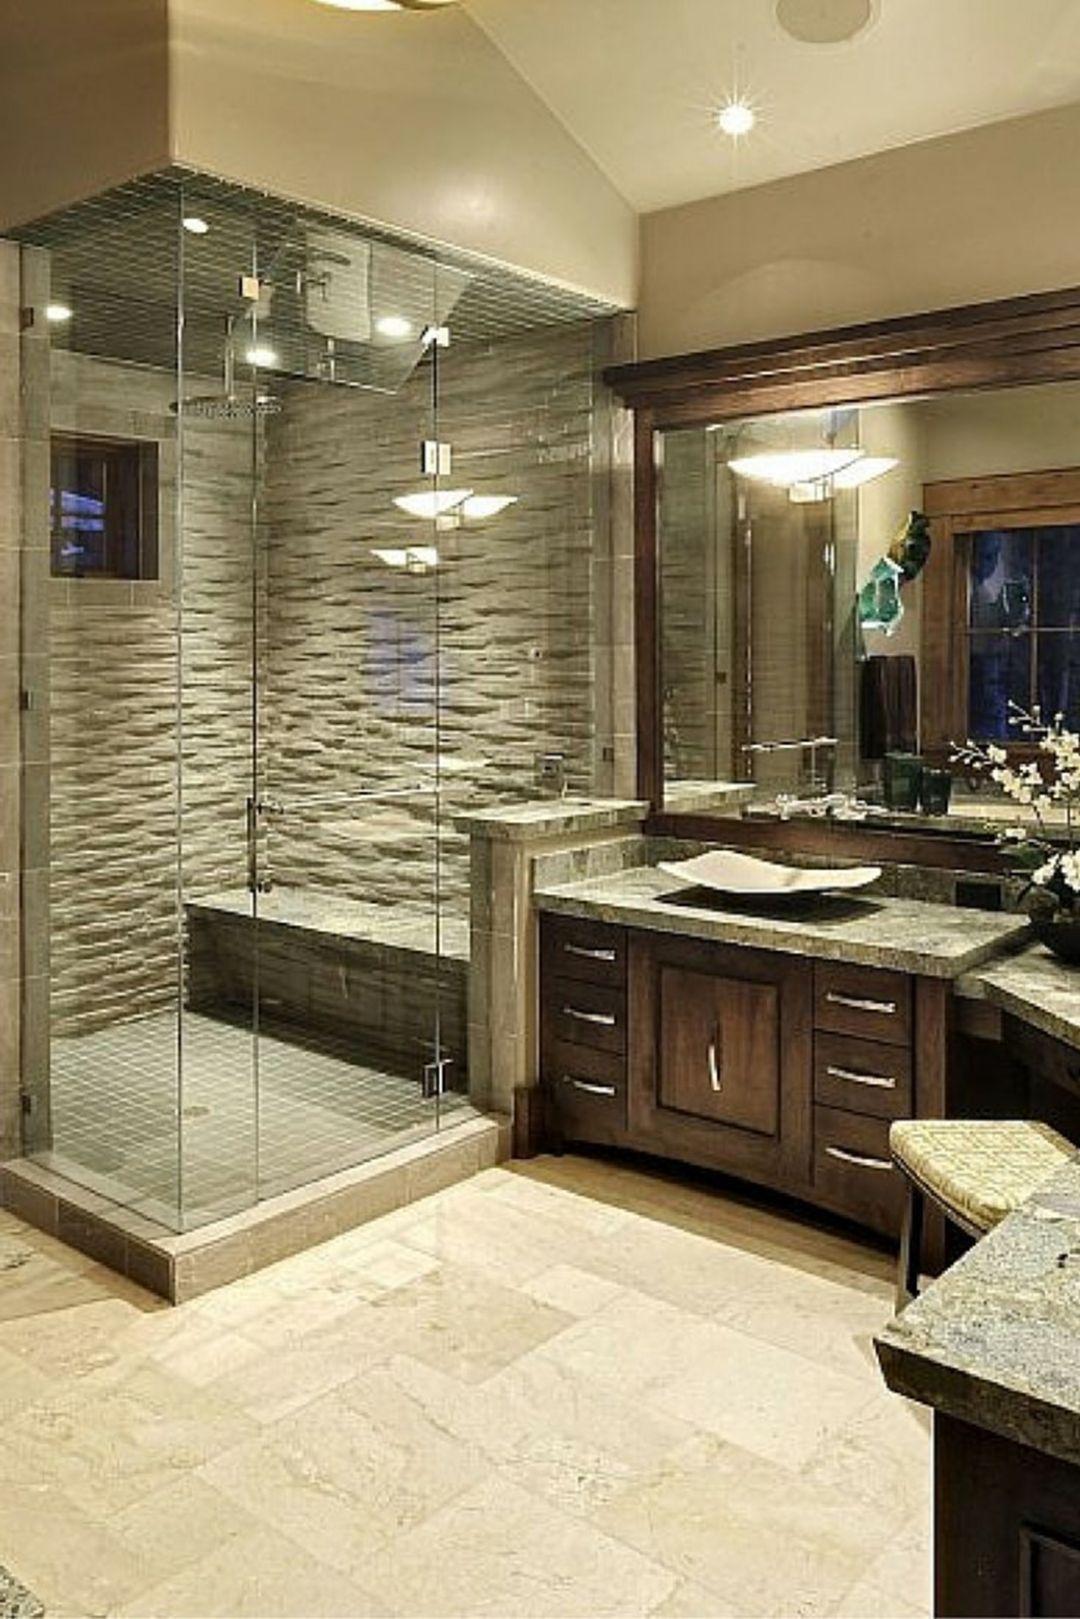 30 cool bathroom shower design ideas bathroom remodel on cool small bathroom design ideas id=70512